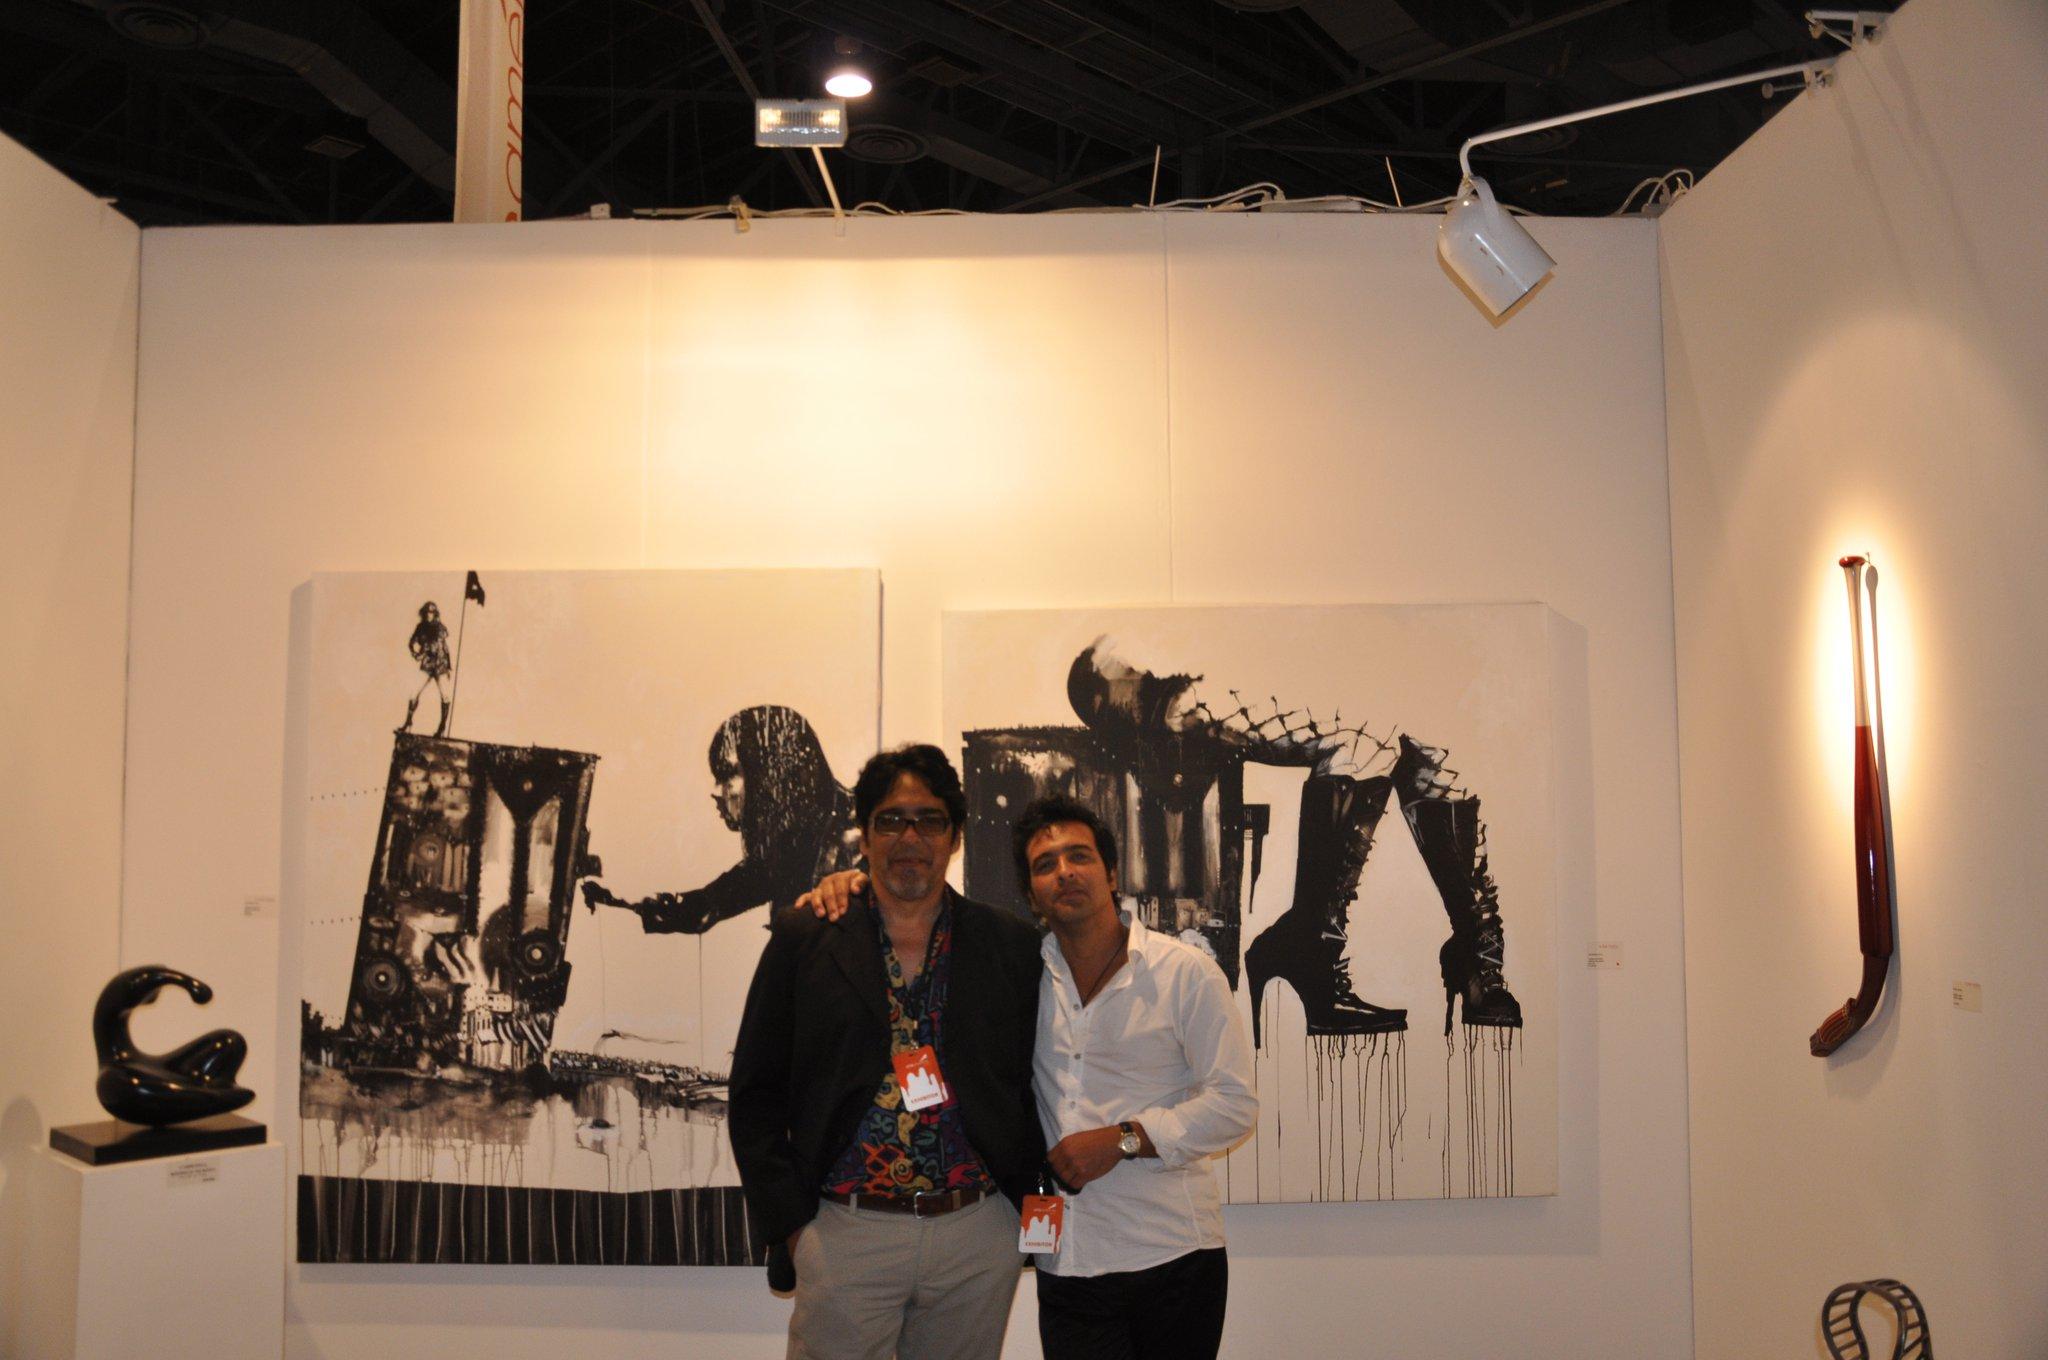 ART BASEL 2011, Kavachina Gallery, Miami, Florida